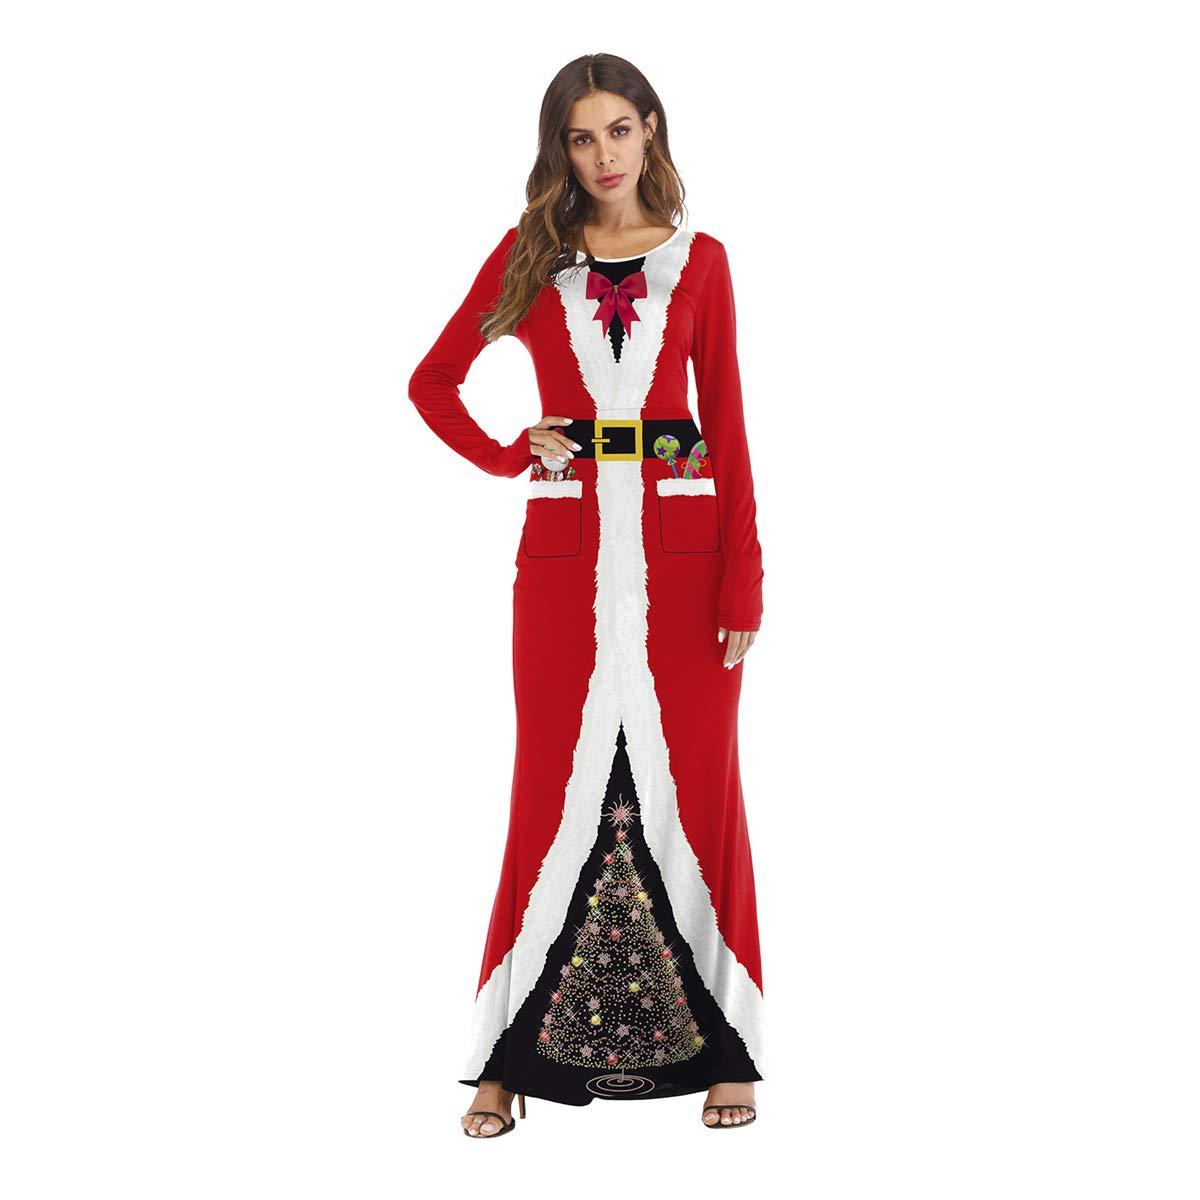 USDREAM Women Xmas Mrs.Santa Clause Sweetie Costume Cosplay Long Fancy Dress